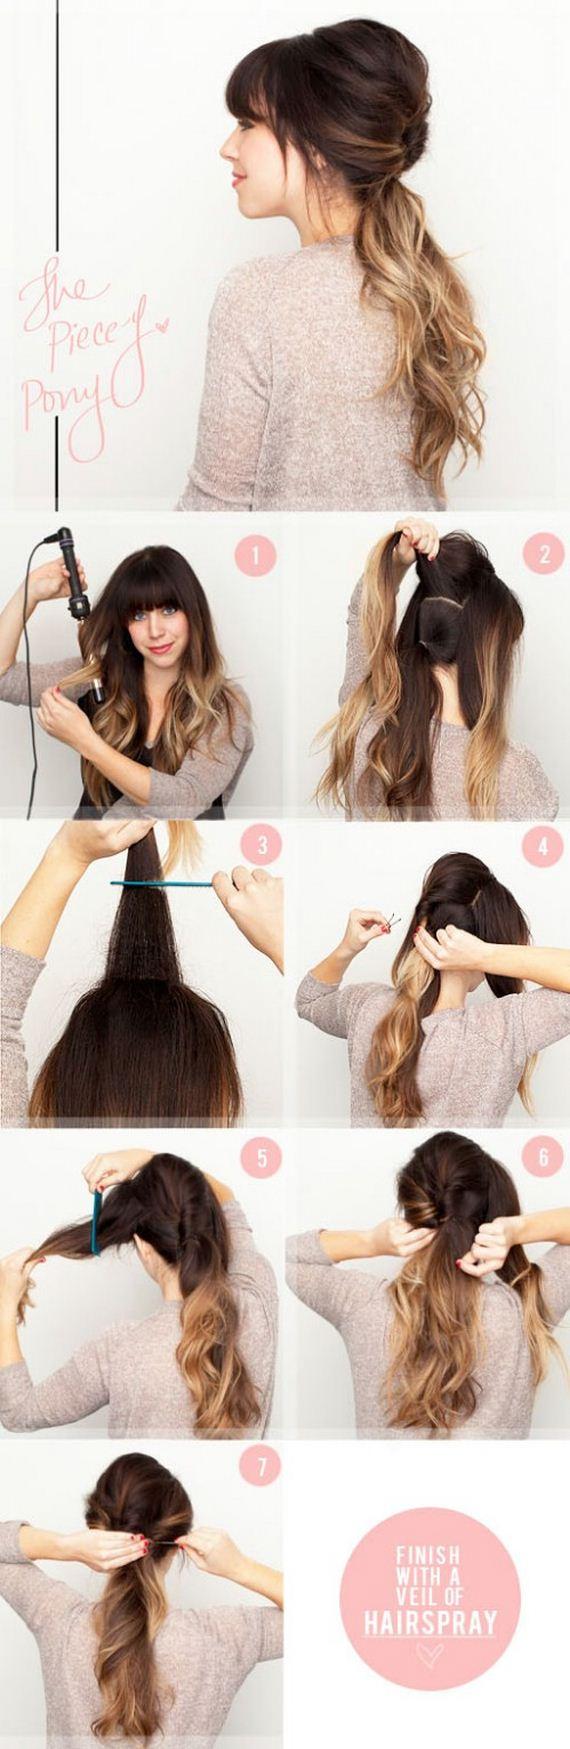 14-double-ponytail